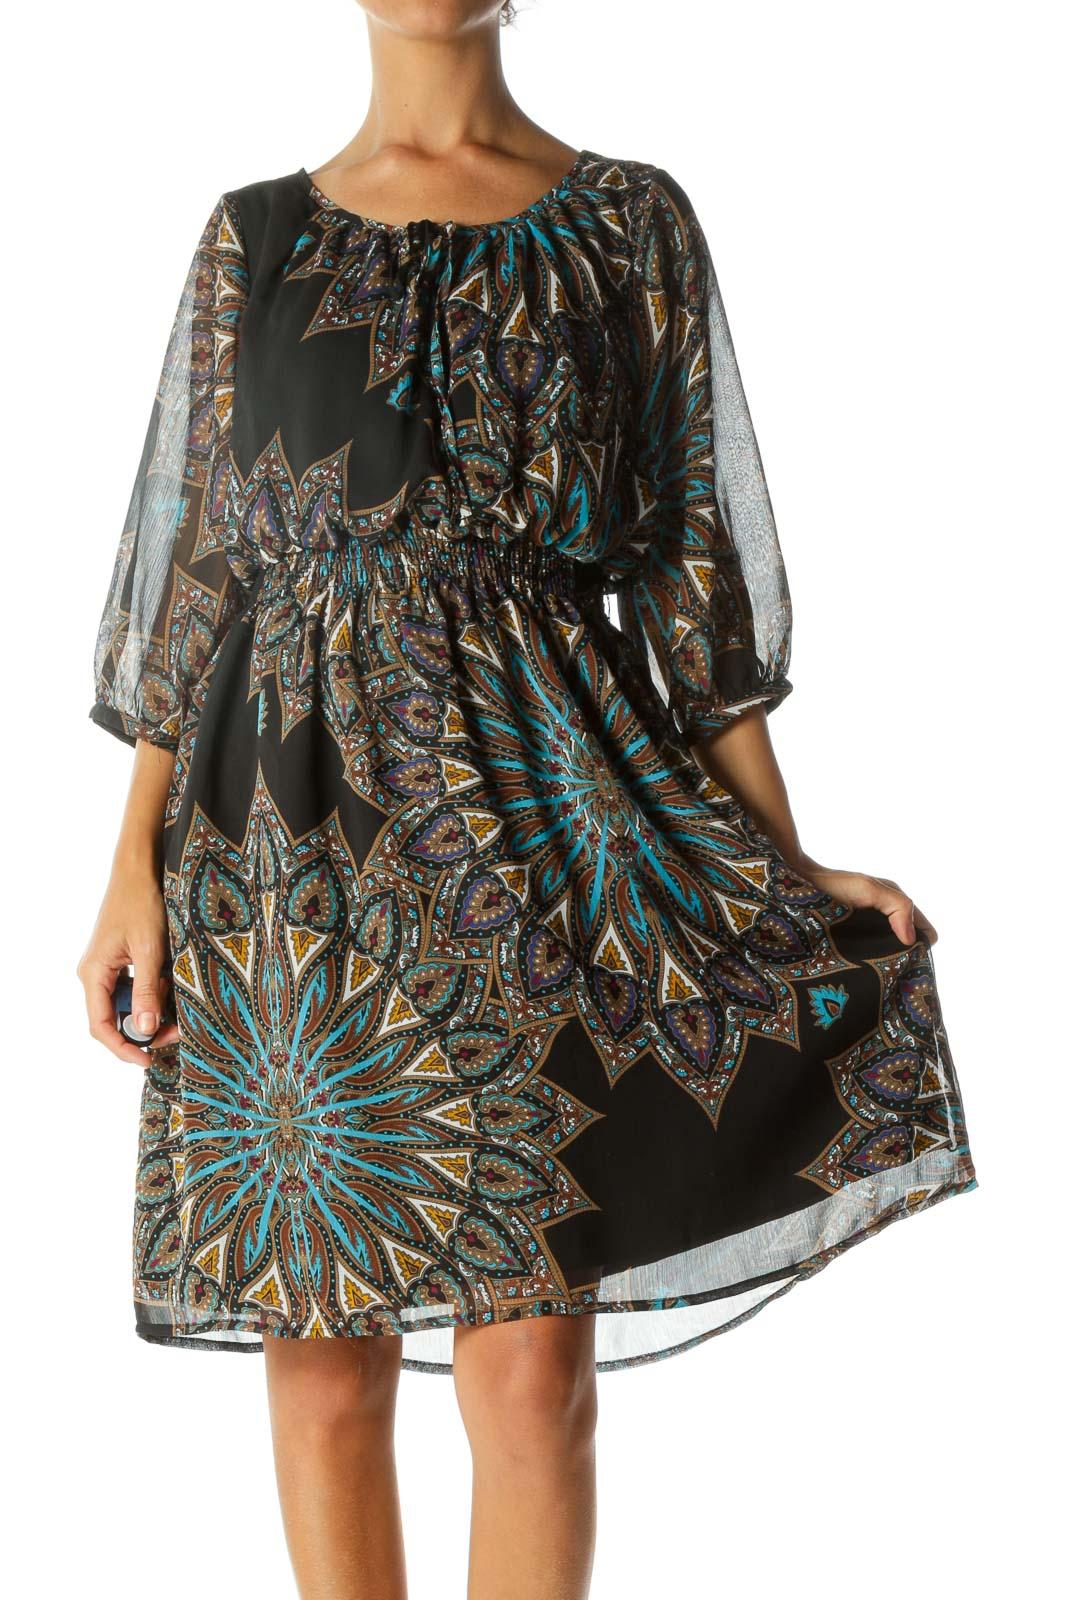 Multicolored Keyhole 3/4 Sleeve Elastic Waist Dress Front